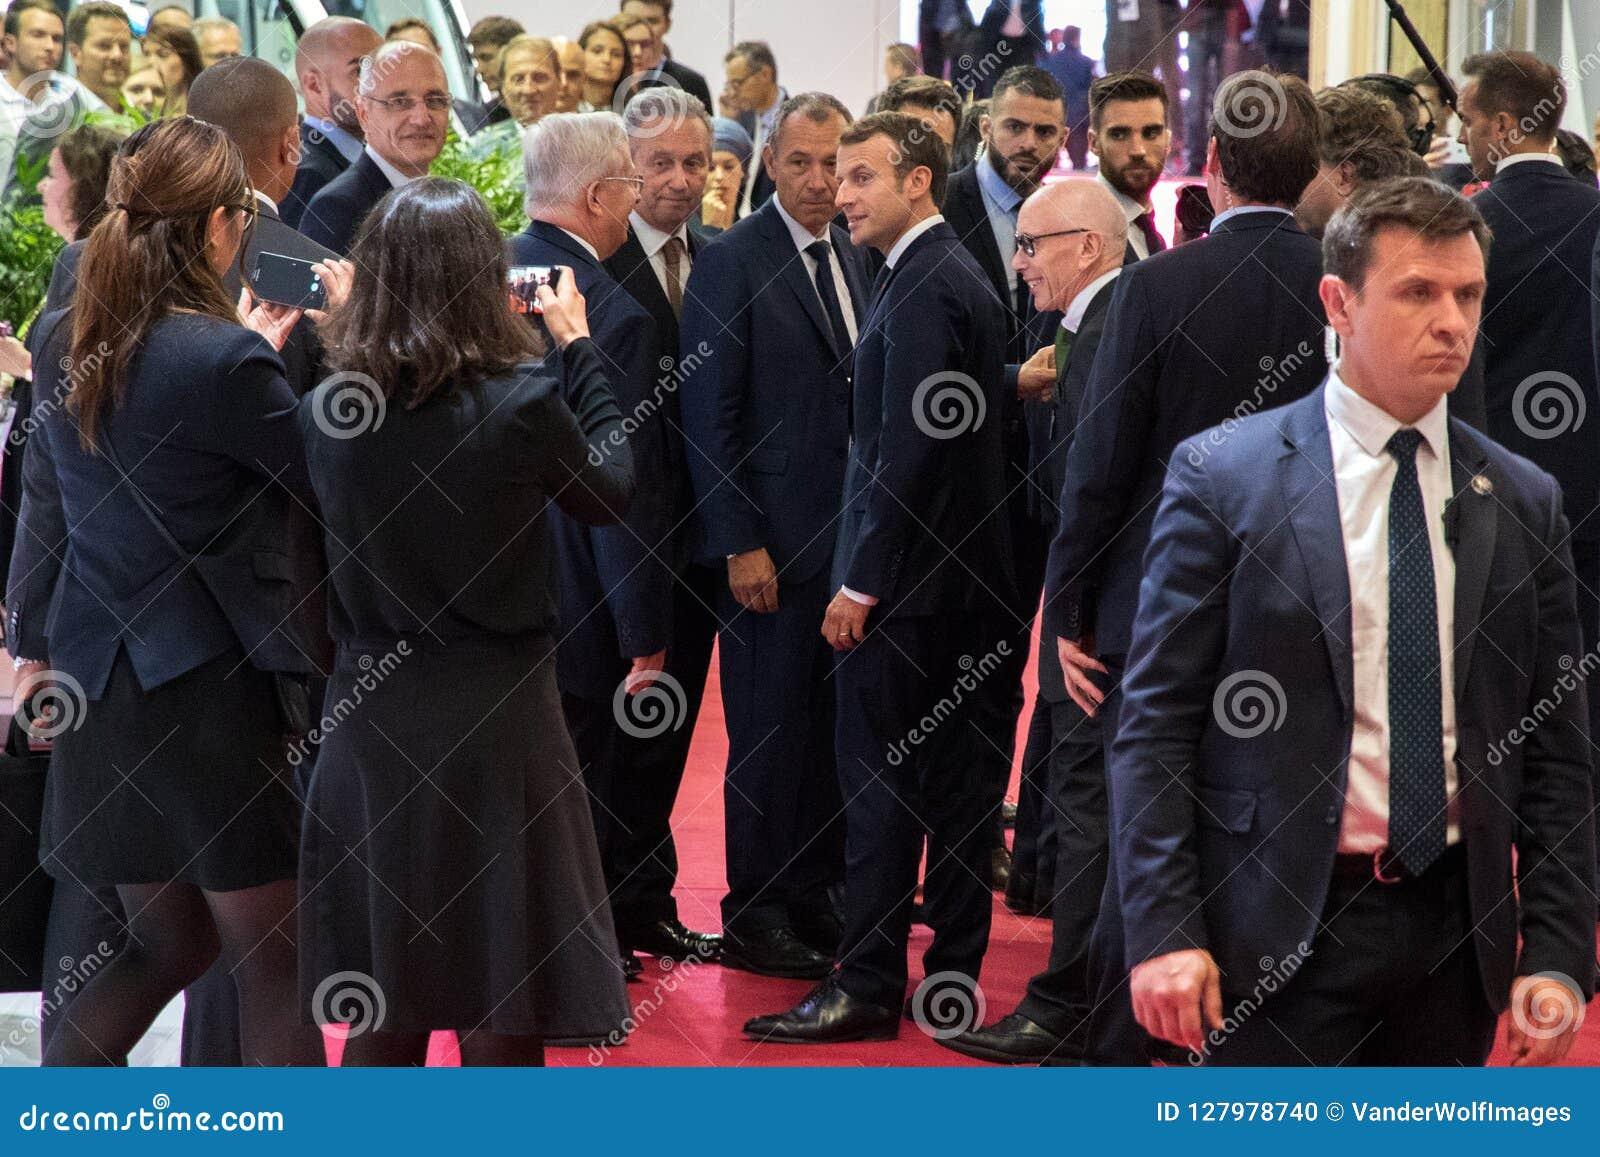 President van Frankrijk Emmanuel Macron